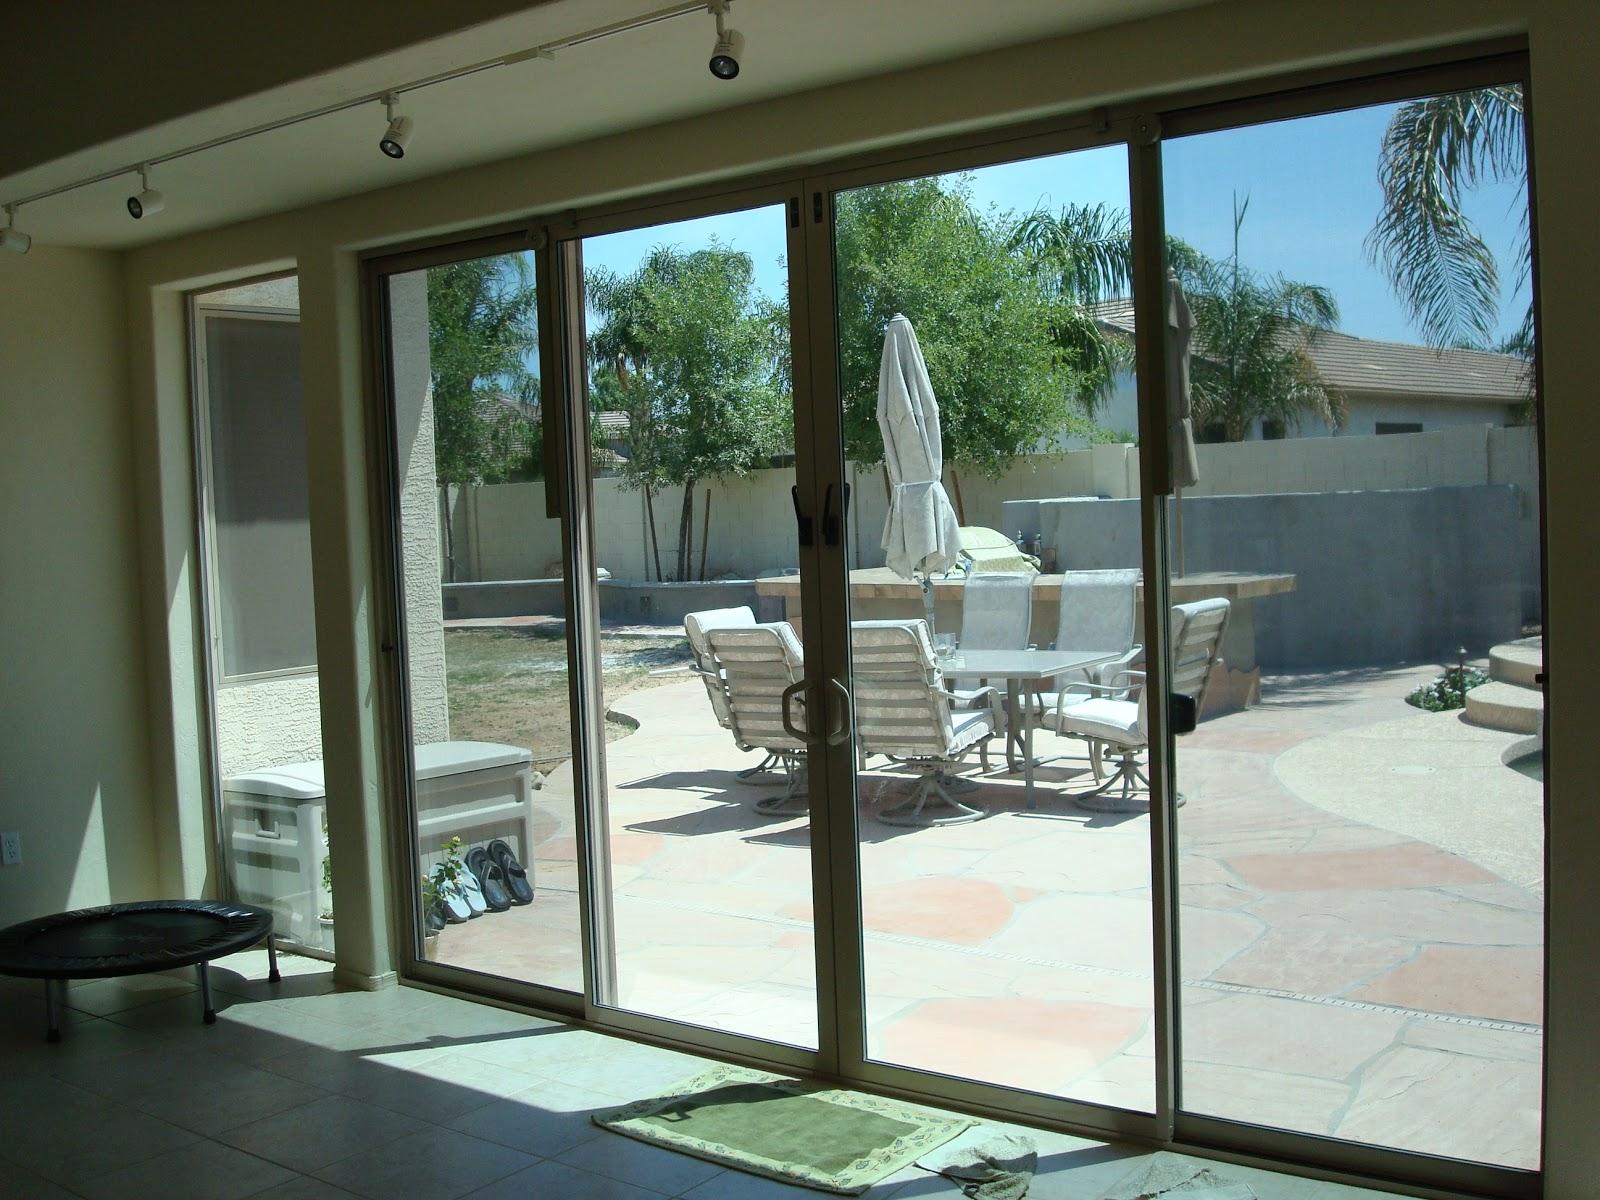 az enclosures and sunrooms 602 791 3228 all glass sunroom or paio enclosure